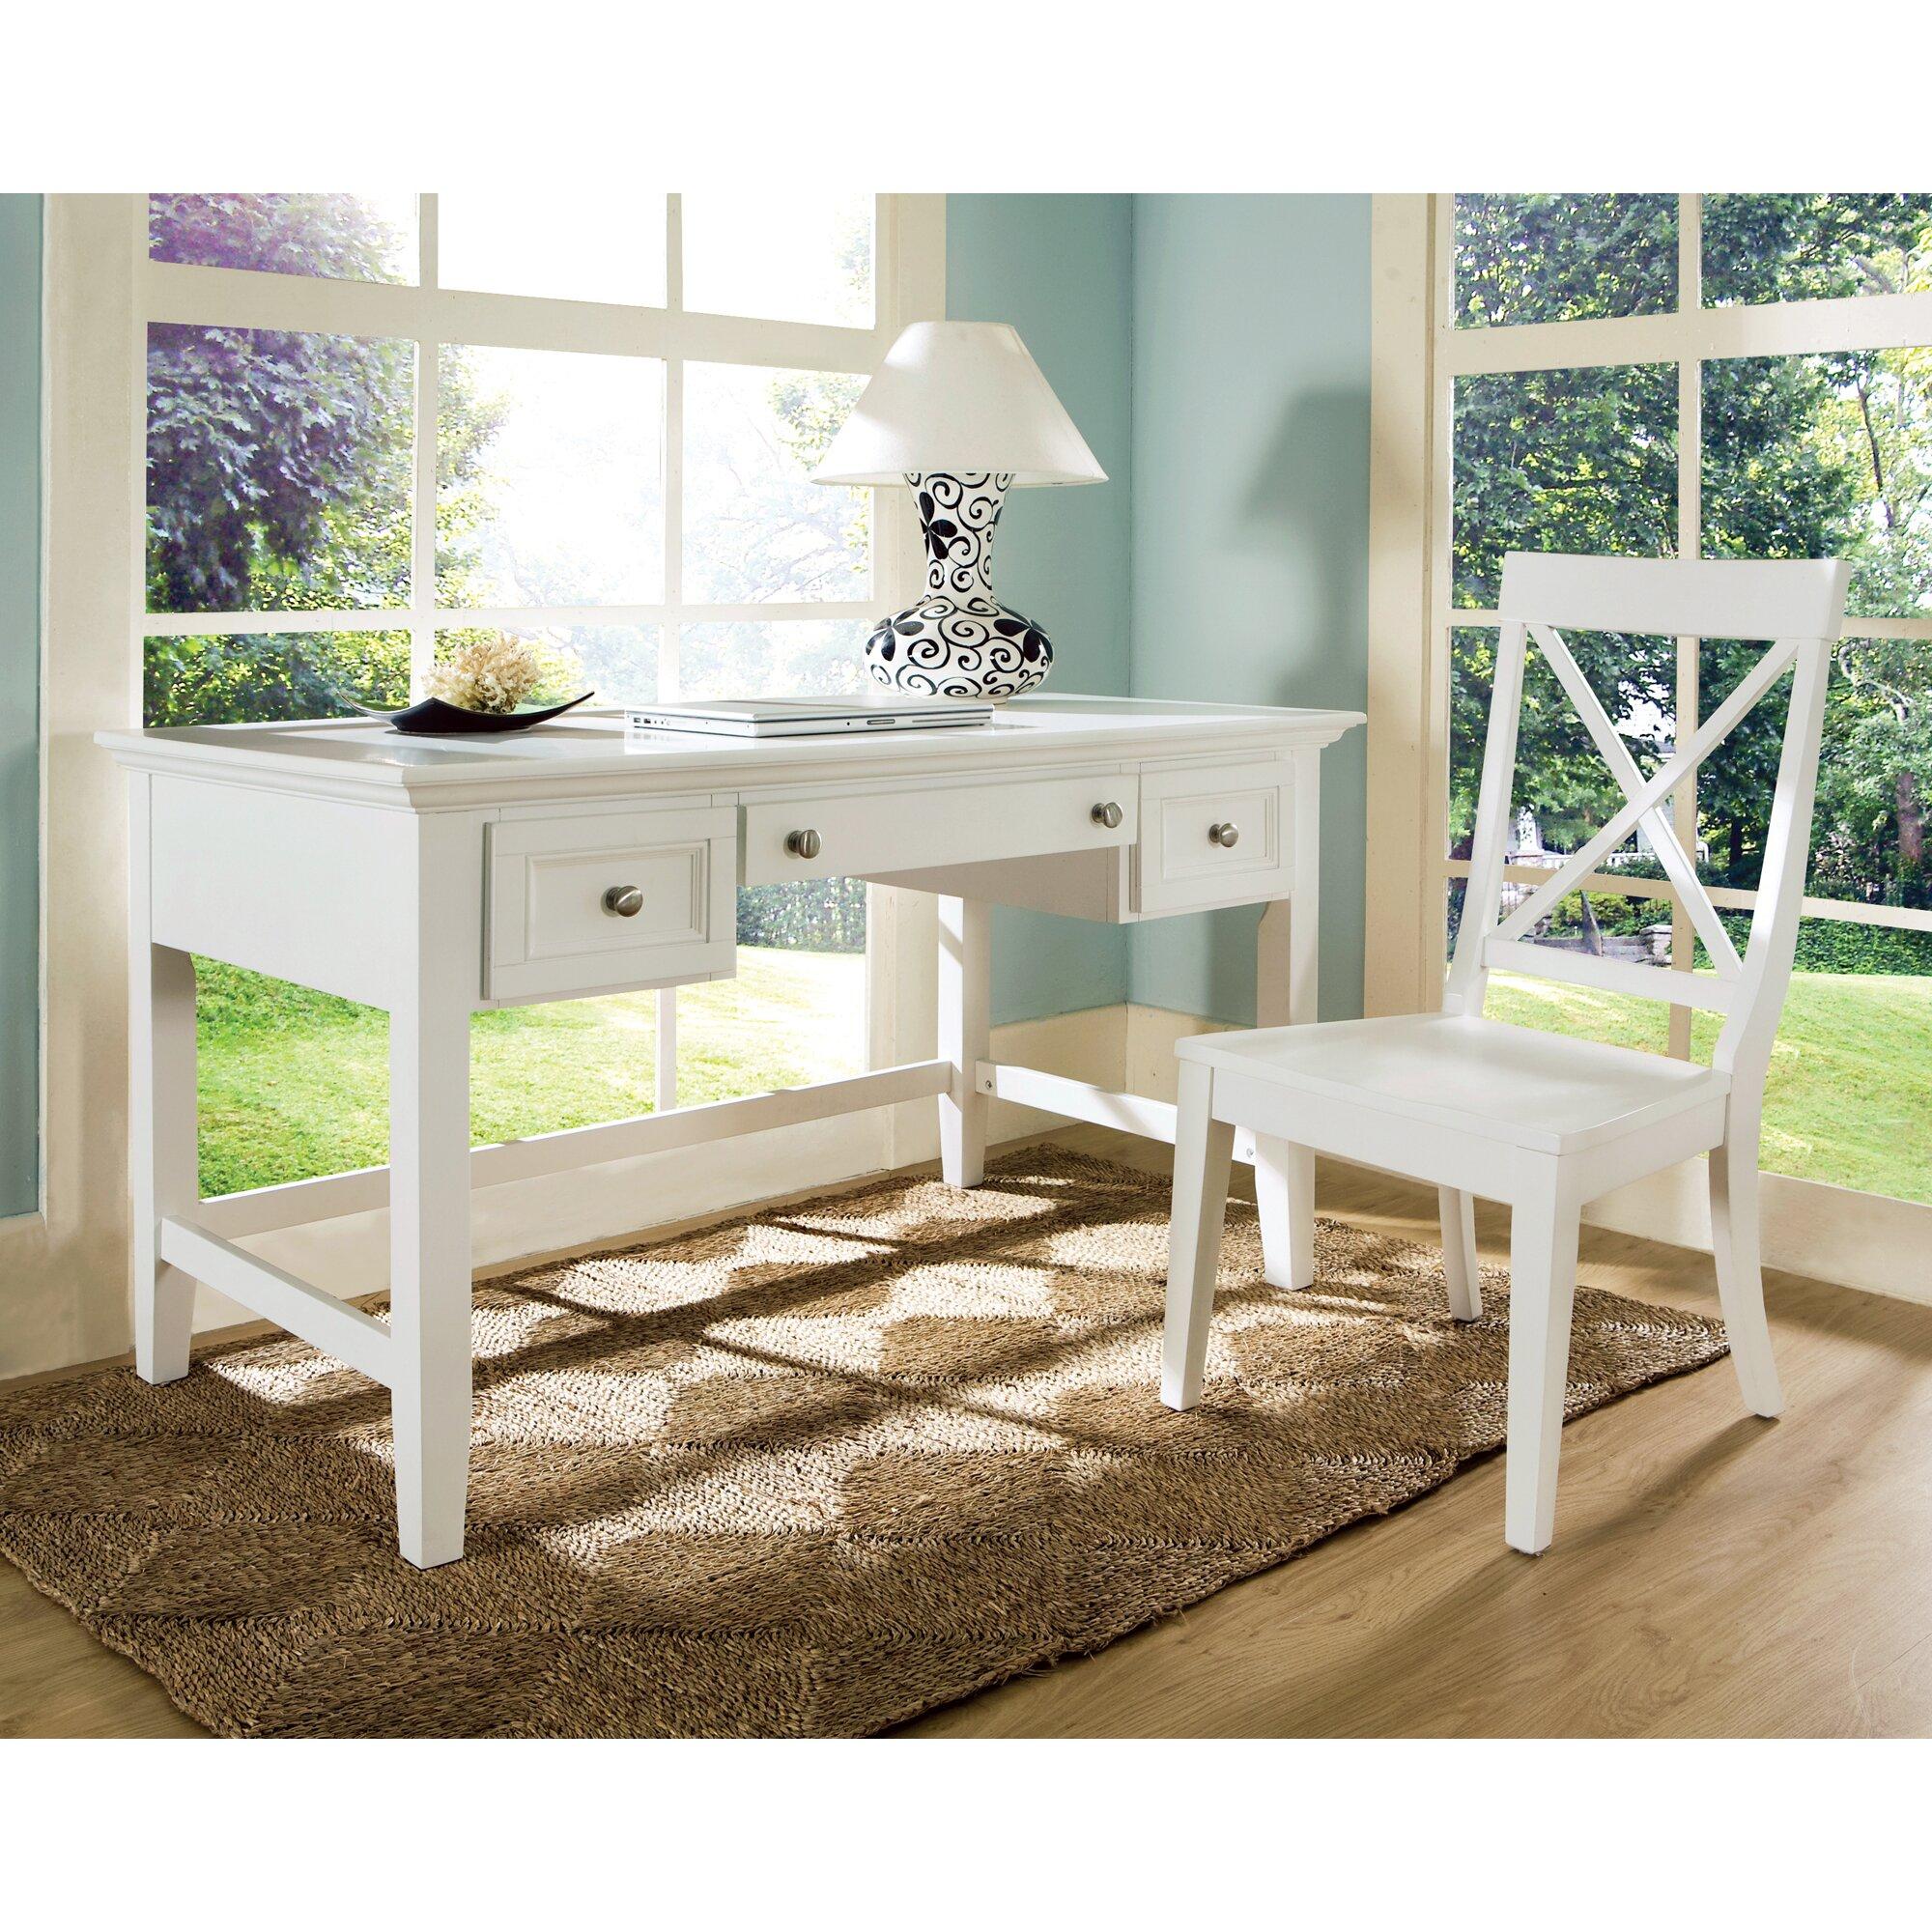 Steve Silver Furniture Oslo Desk Chair Reviews Wayfair